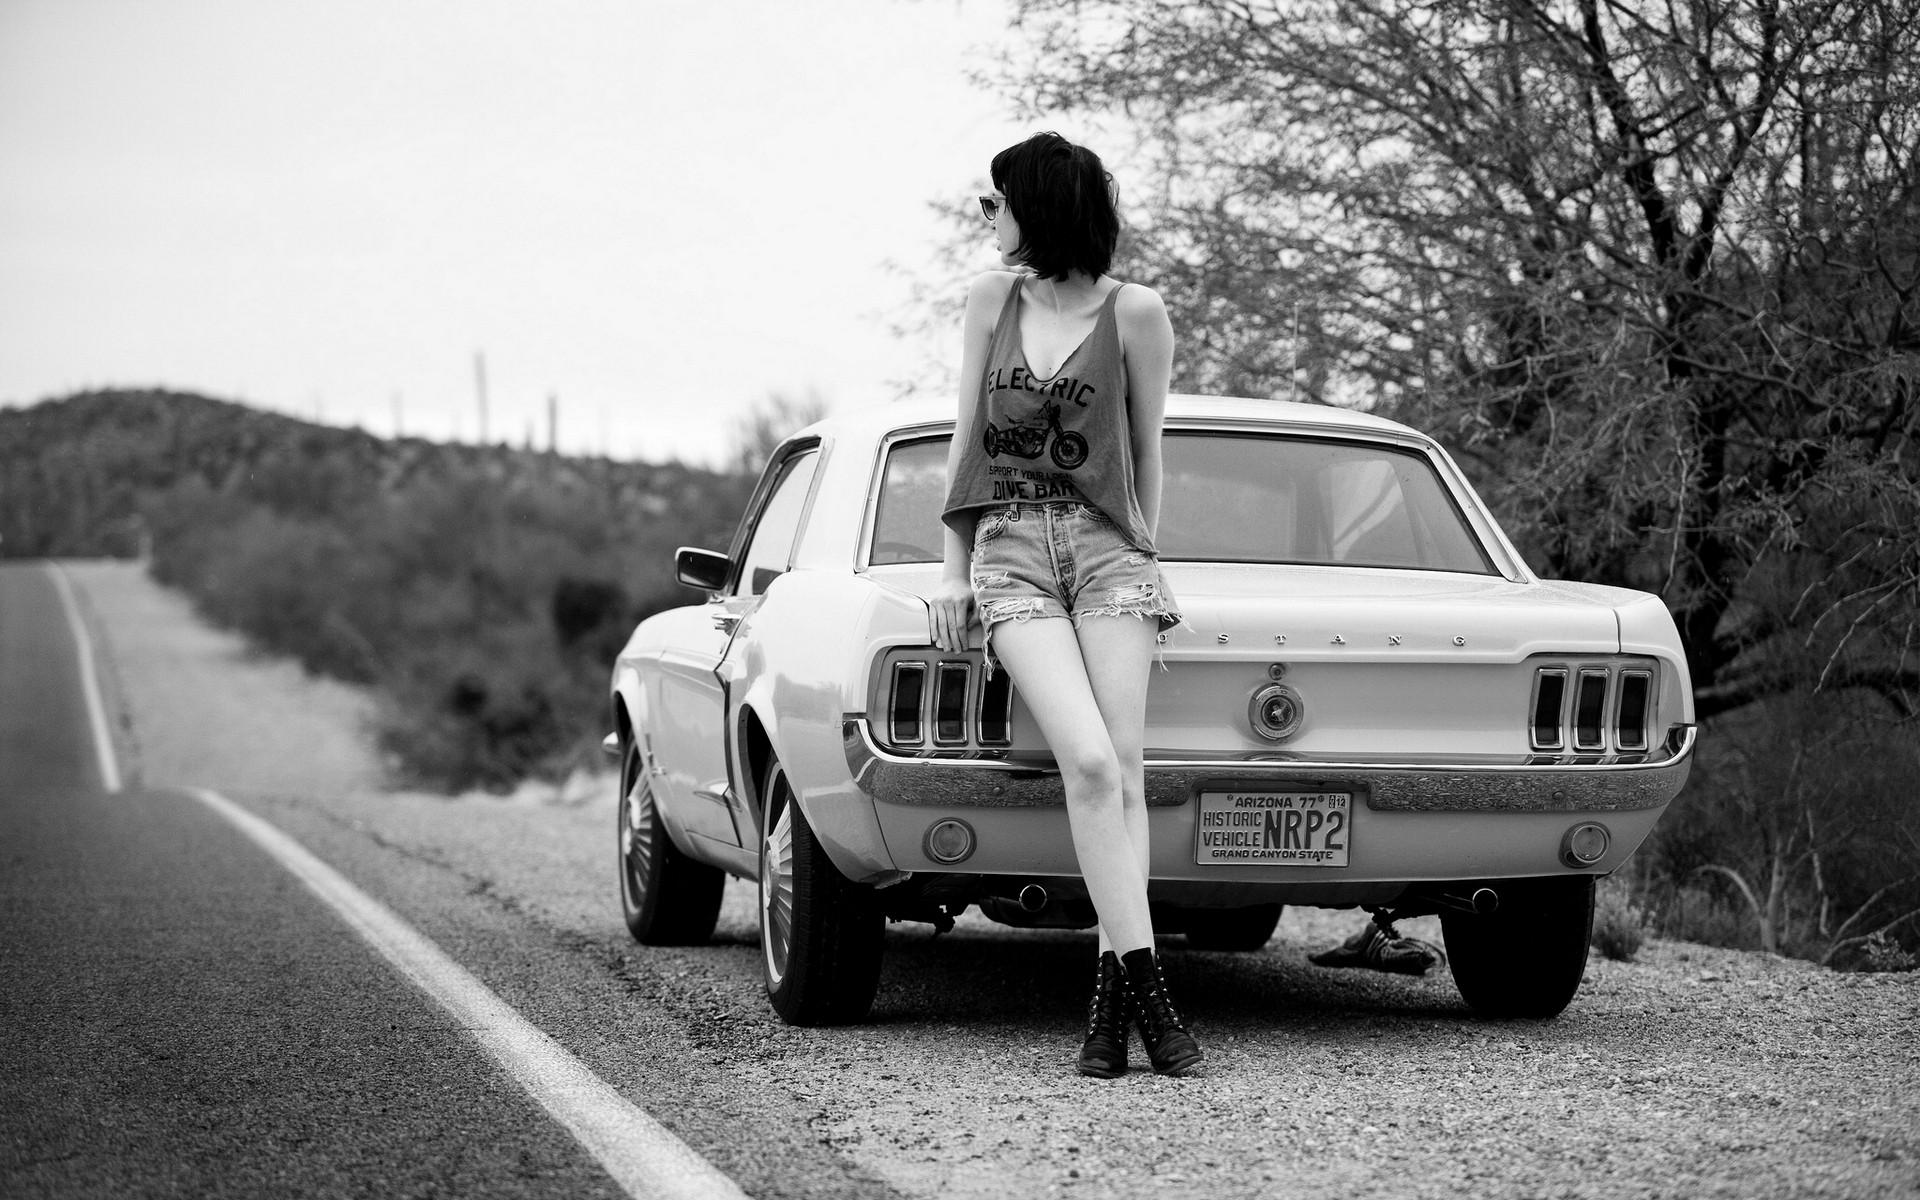 Wallpaper : Women, Model, Black Hair, Ford Mustang, Sports